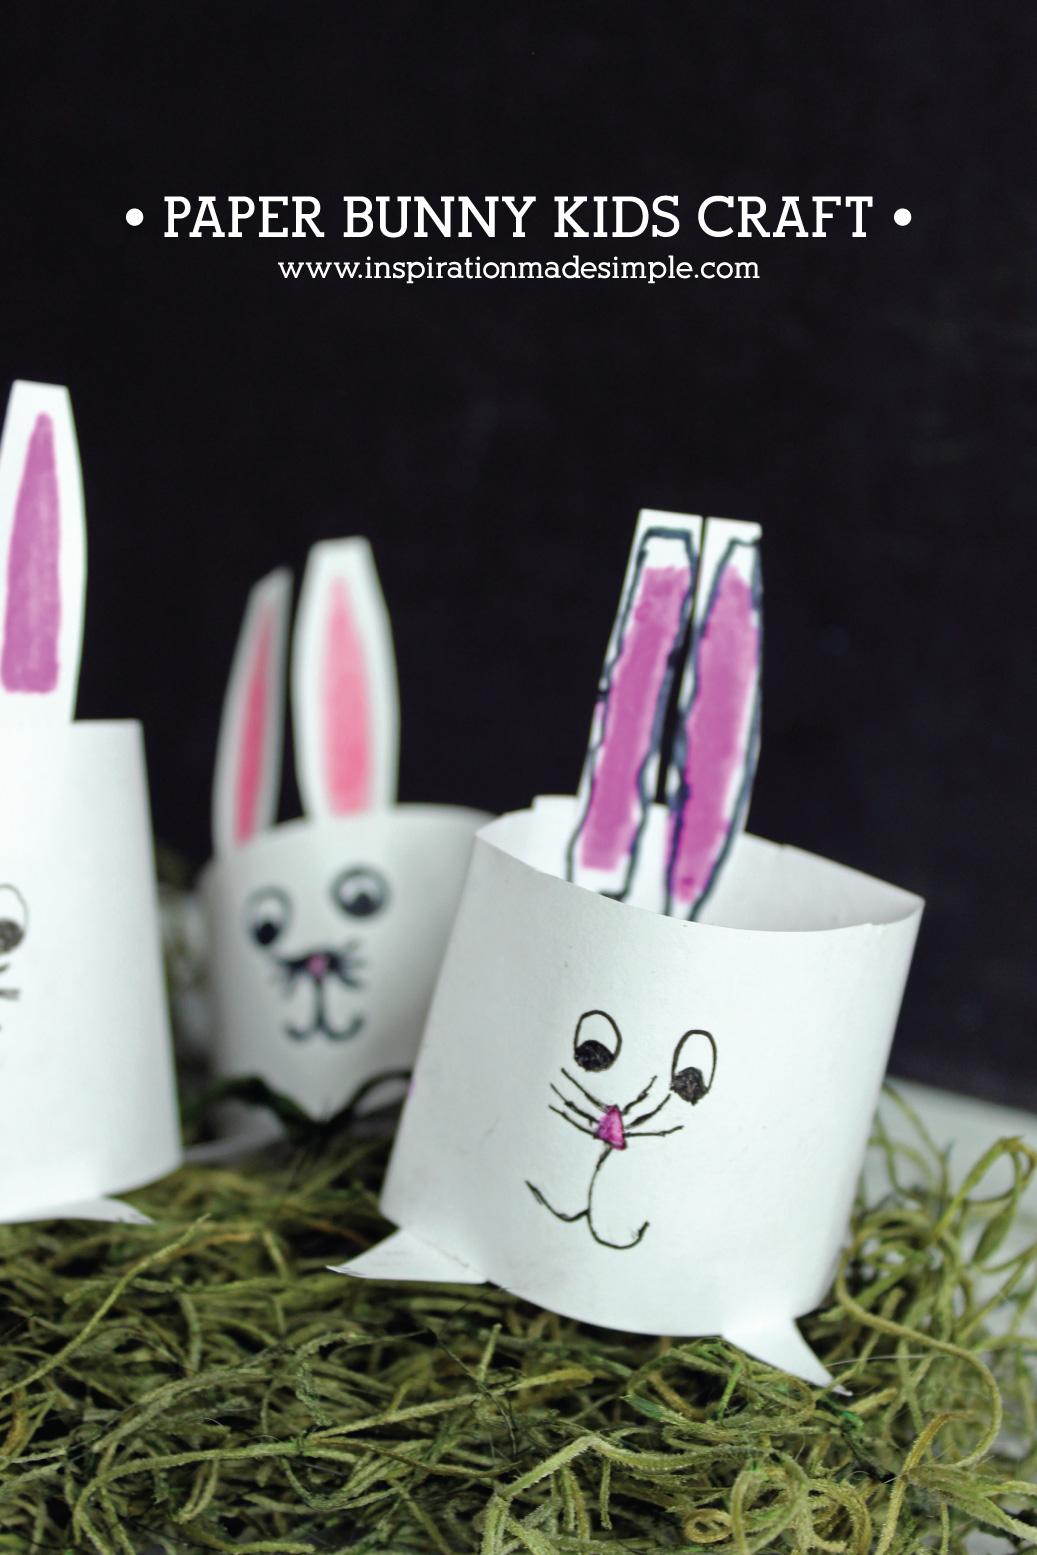 DIY Paper Bunny Kids Craft Tutorial